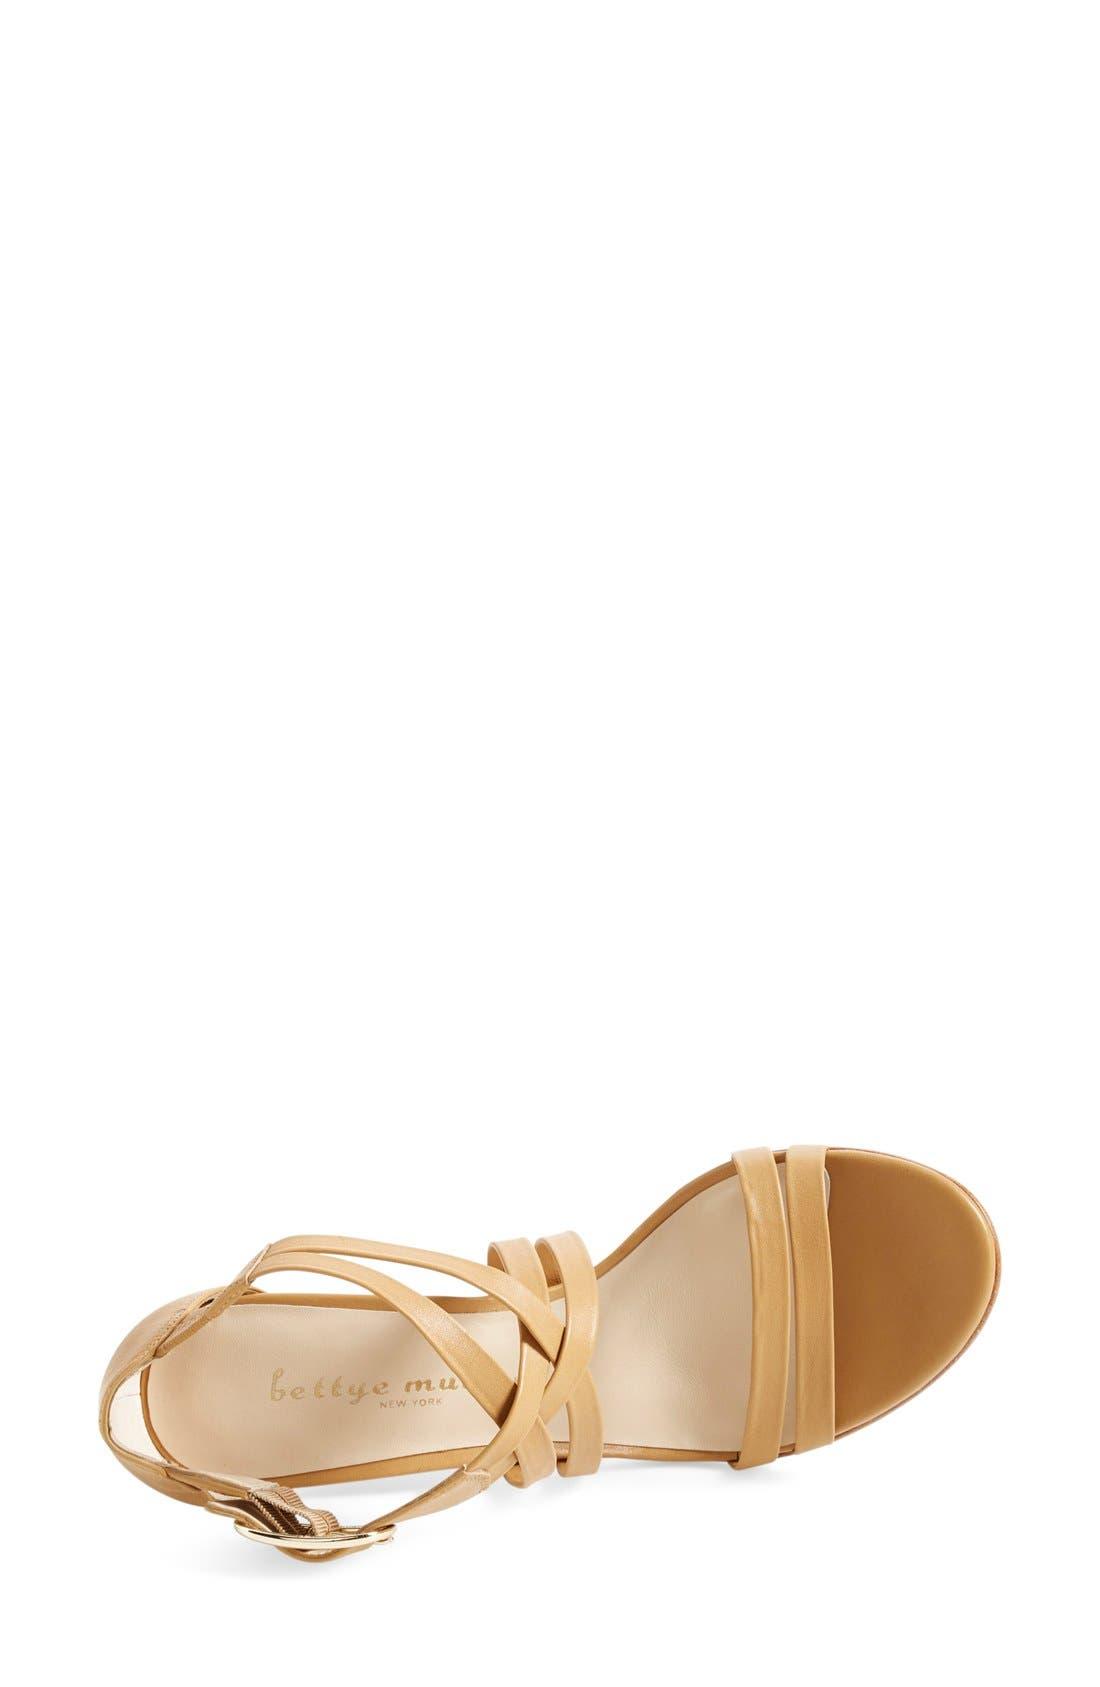 Alternate Image 3  - Bettye Muller 'Cubana' Sandal (Women)